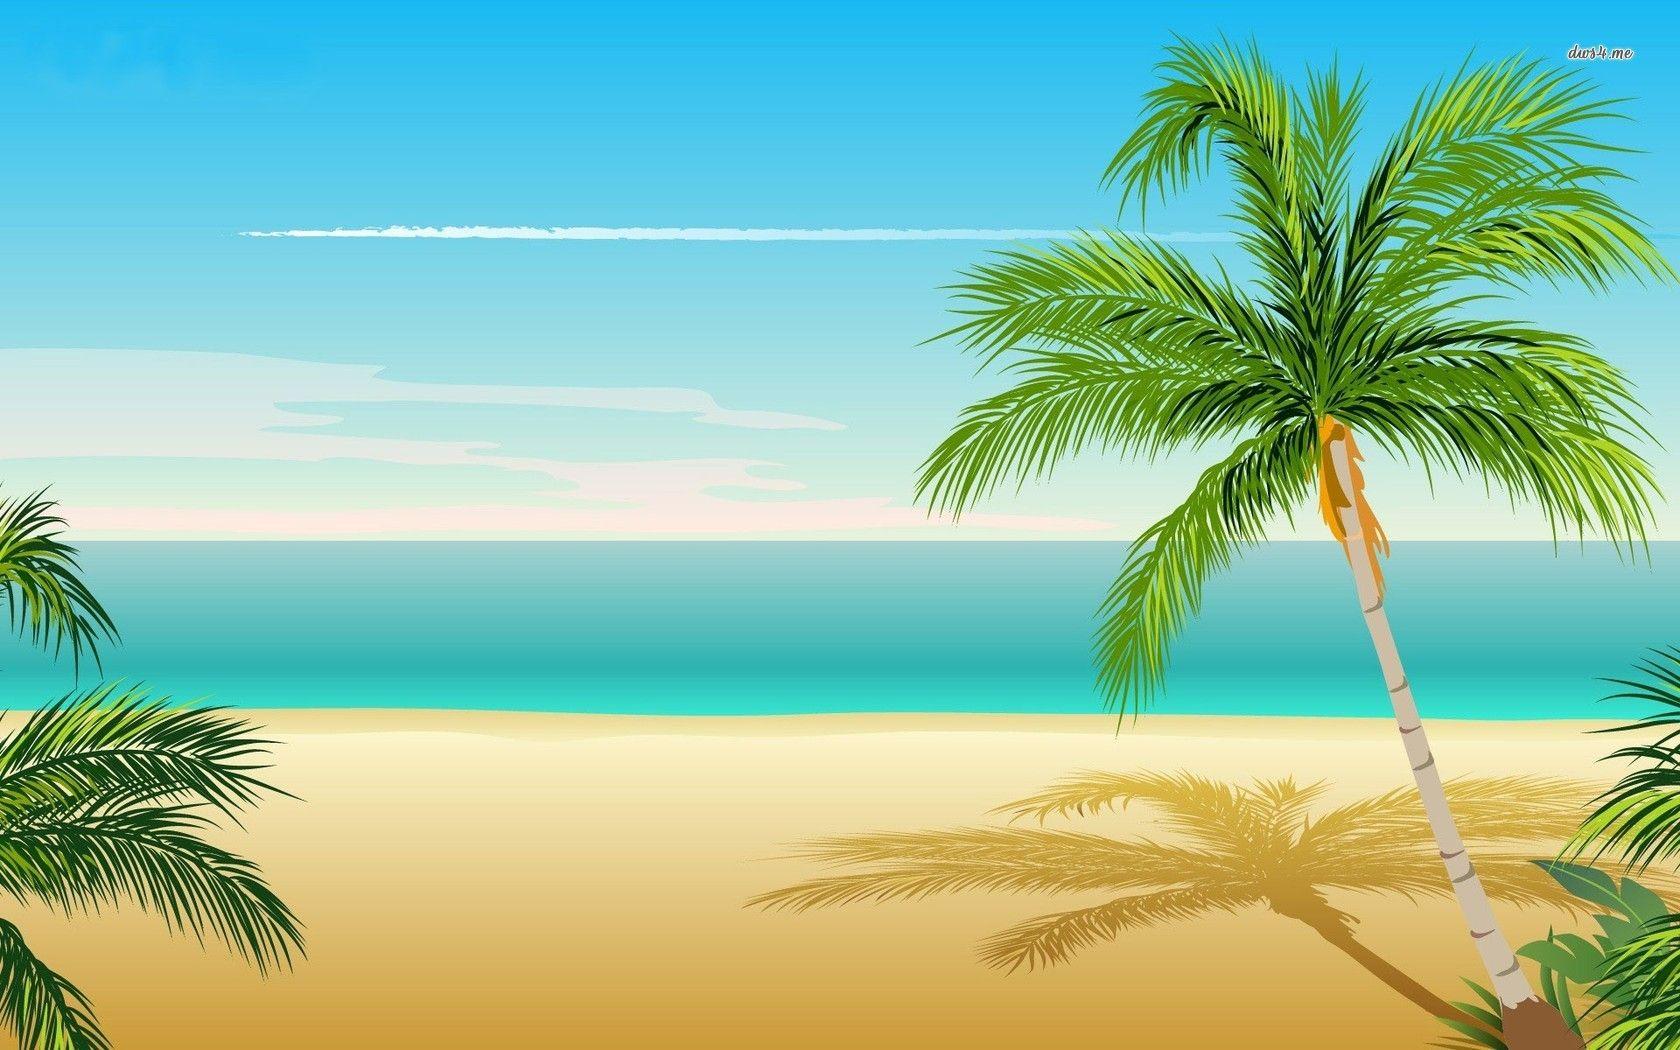 Palm Tree Background iPhone 6 Wallpaper 22011 Beach